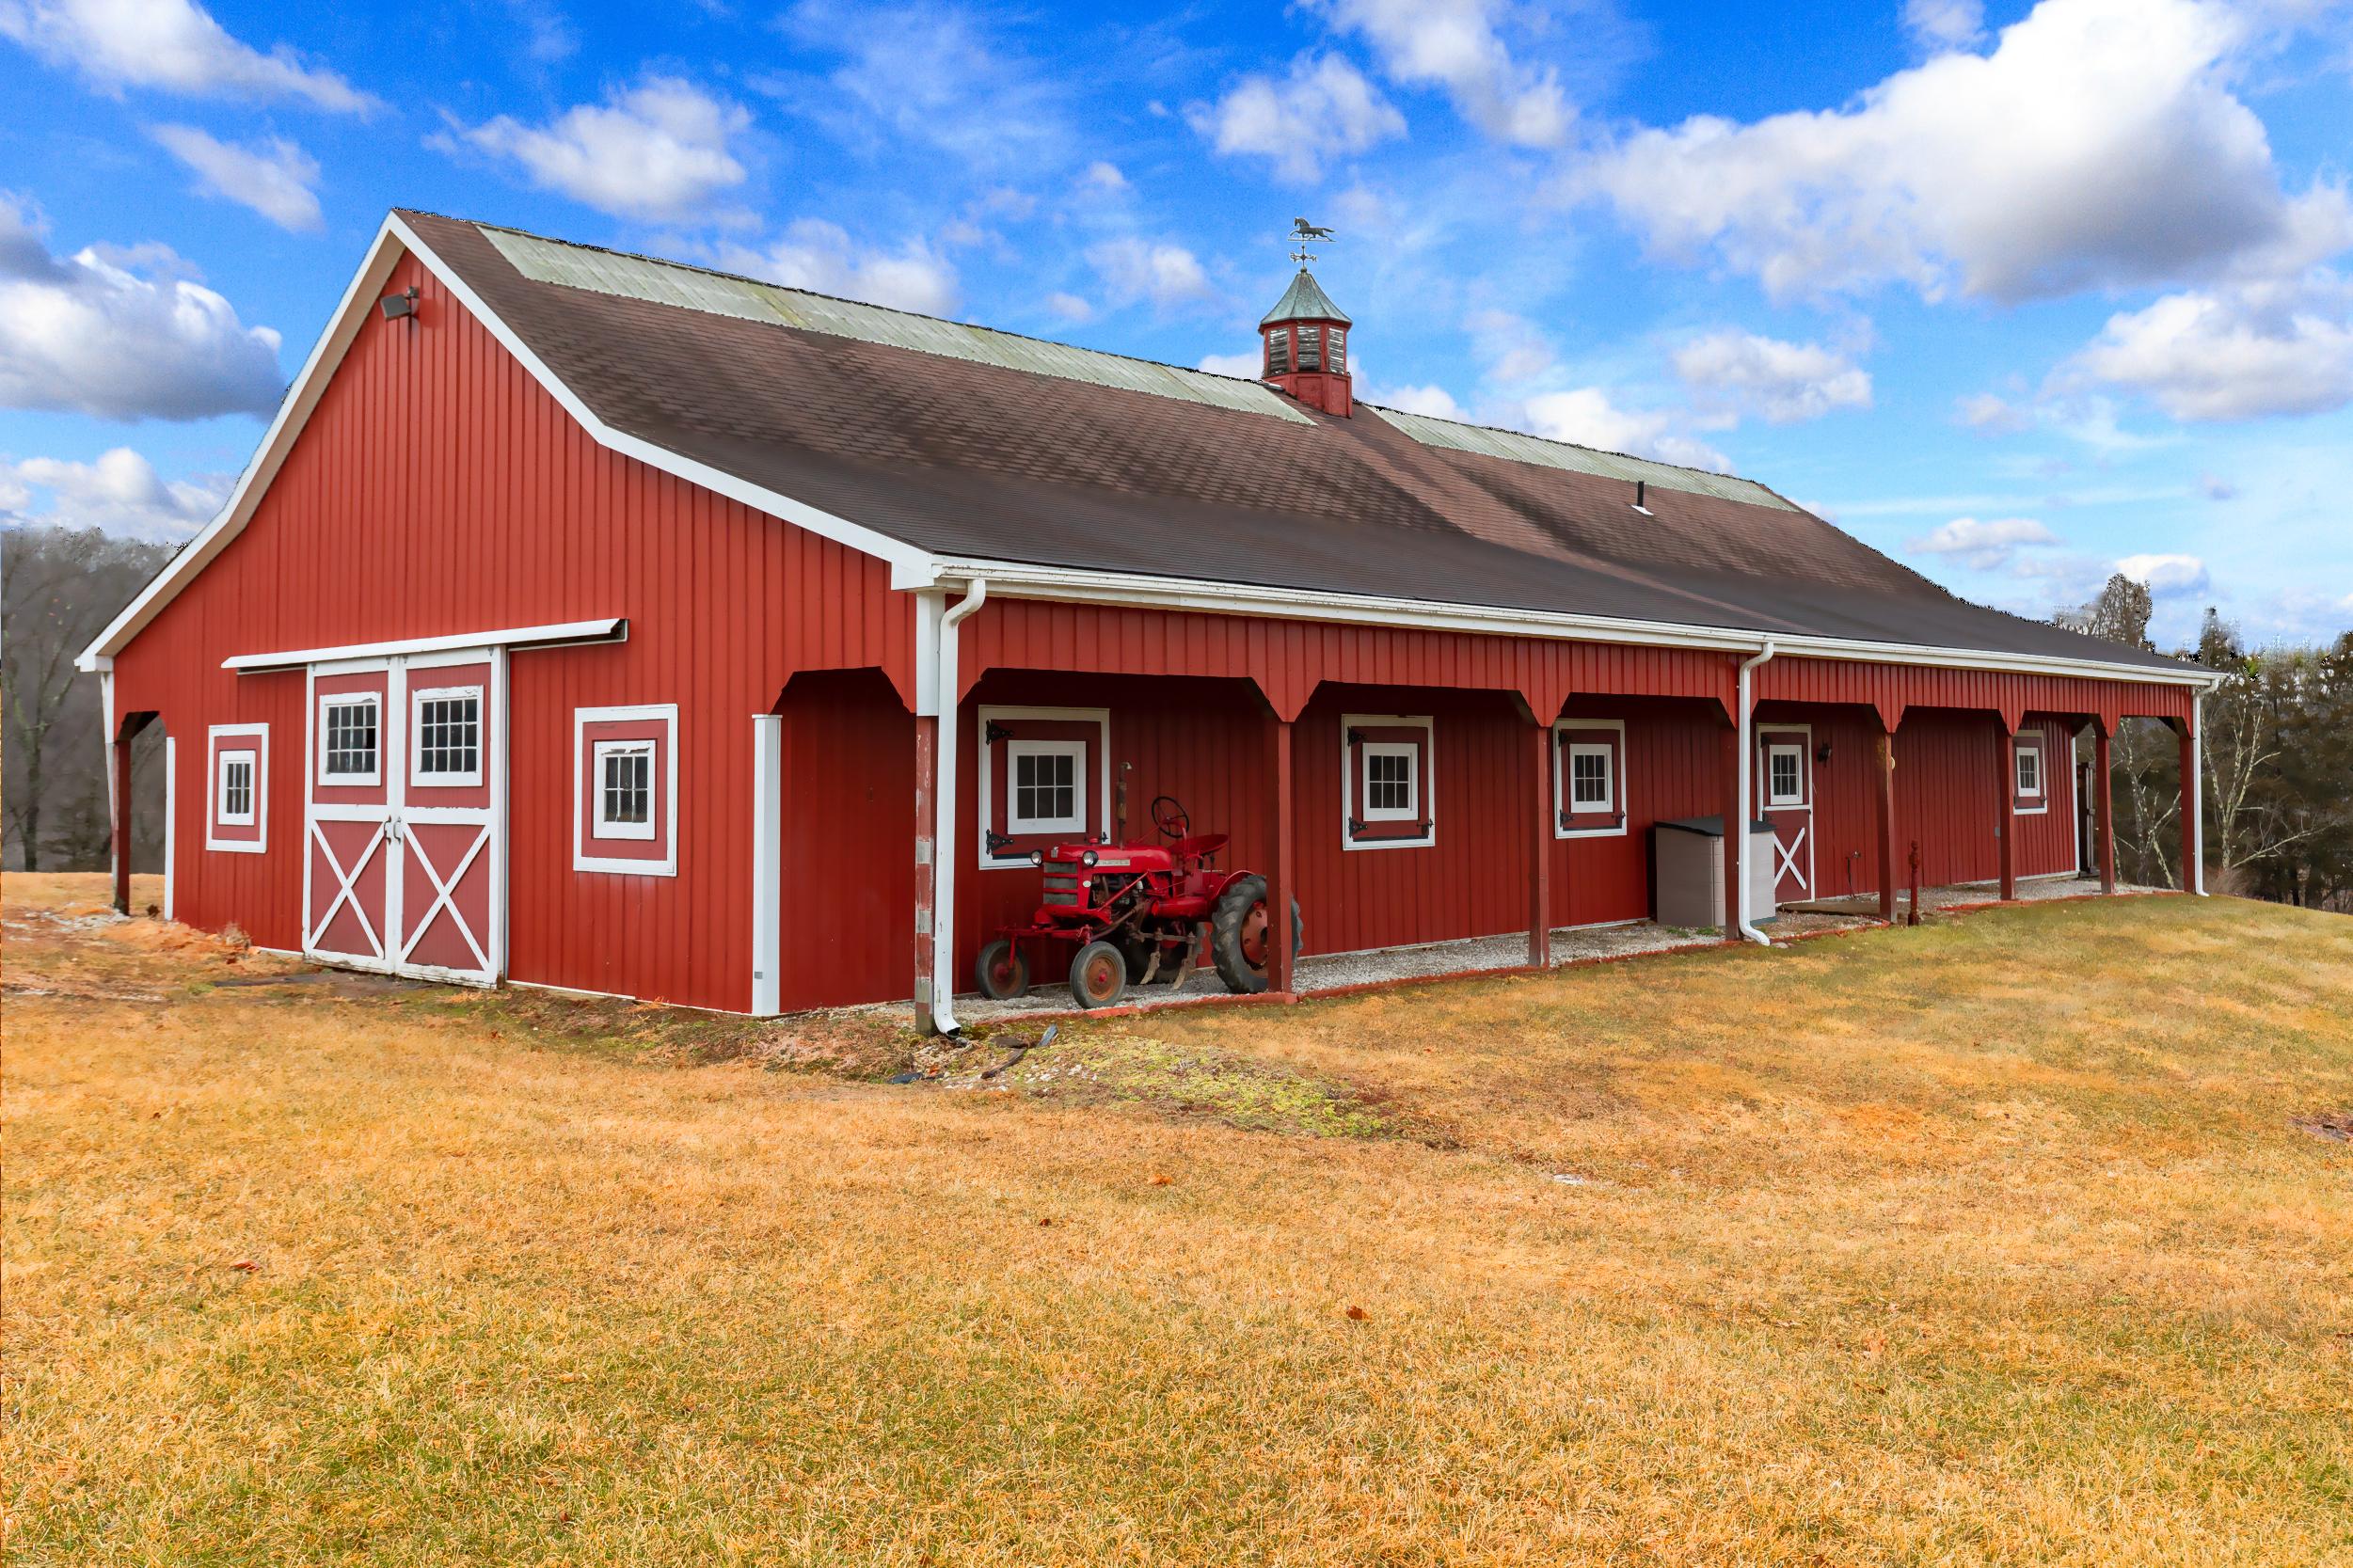 11-horse barn